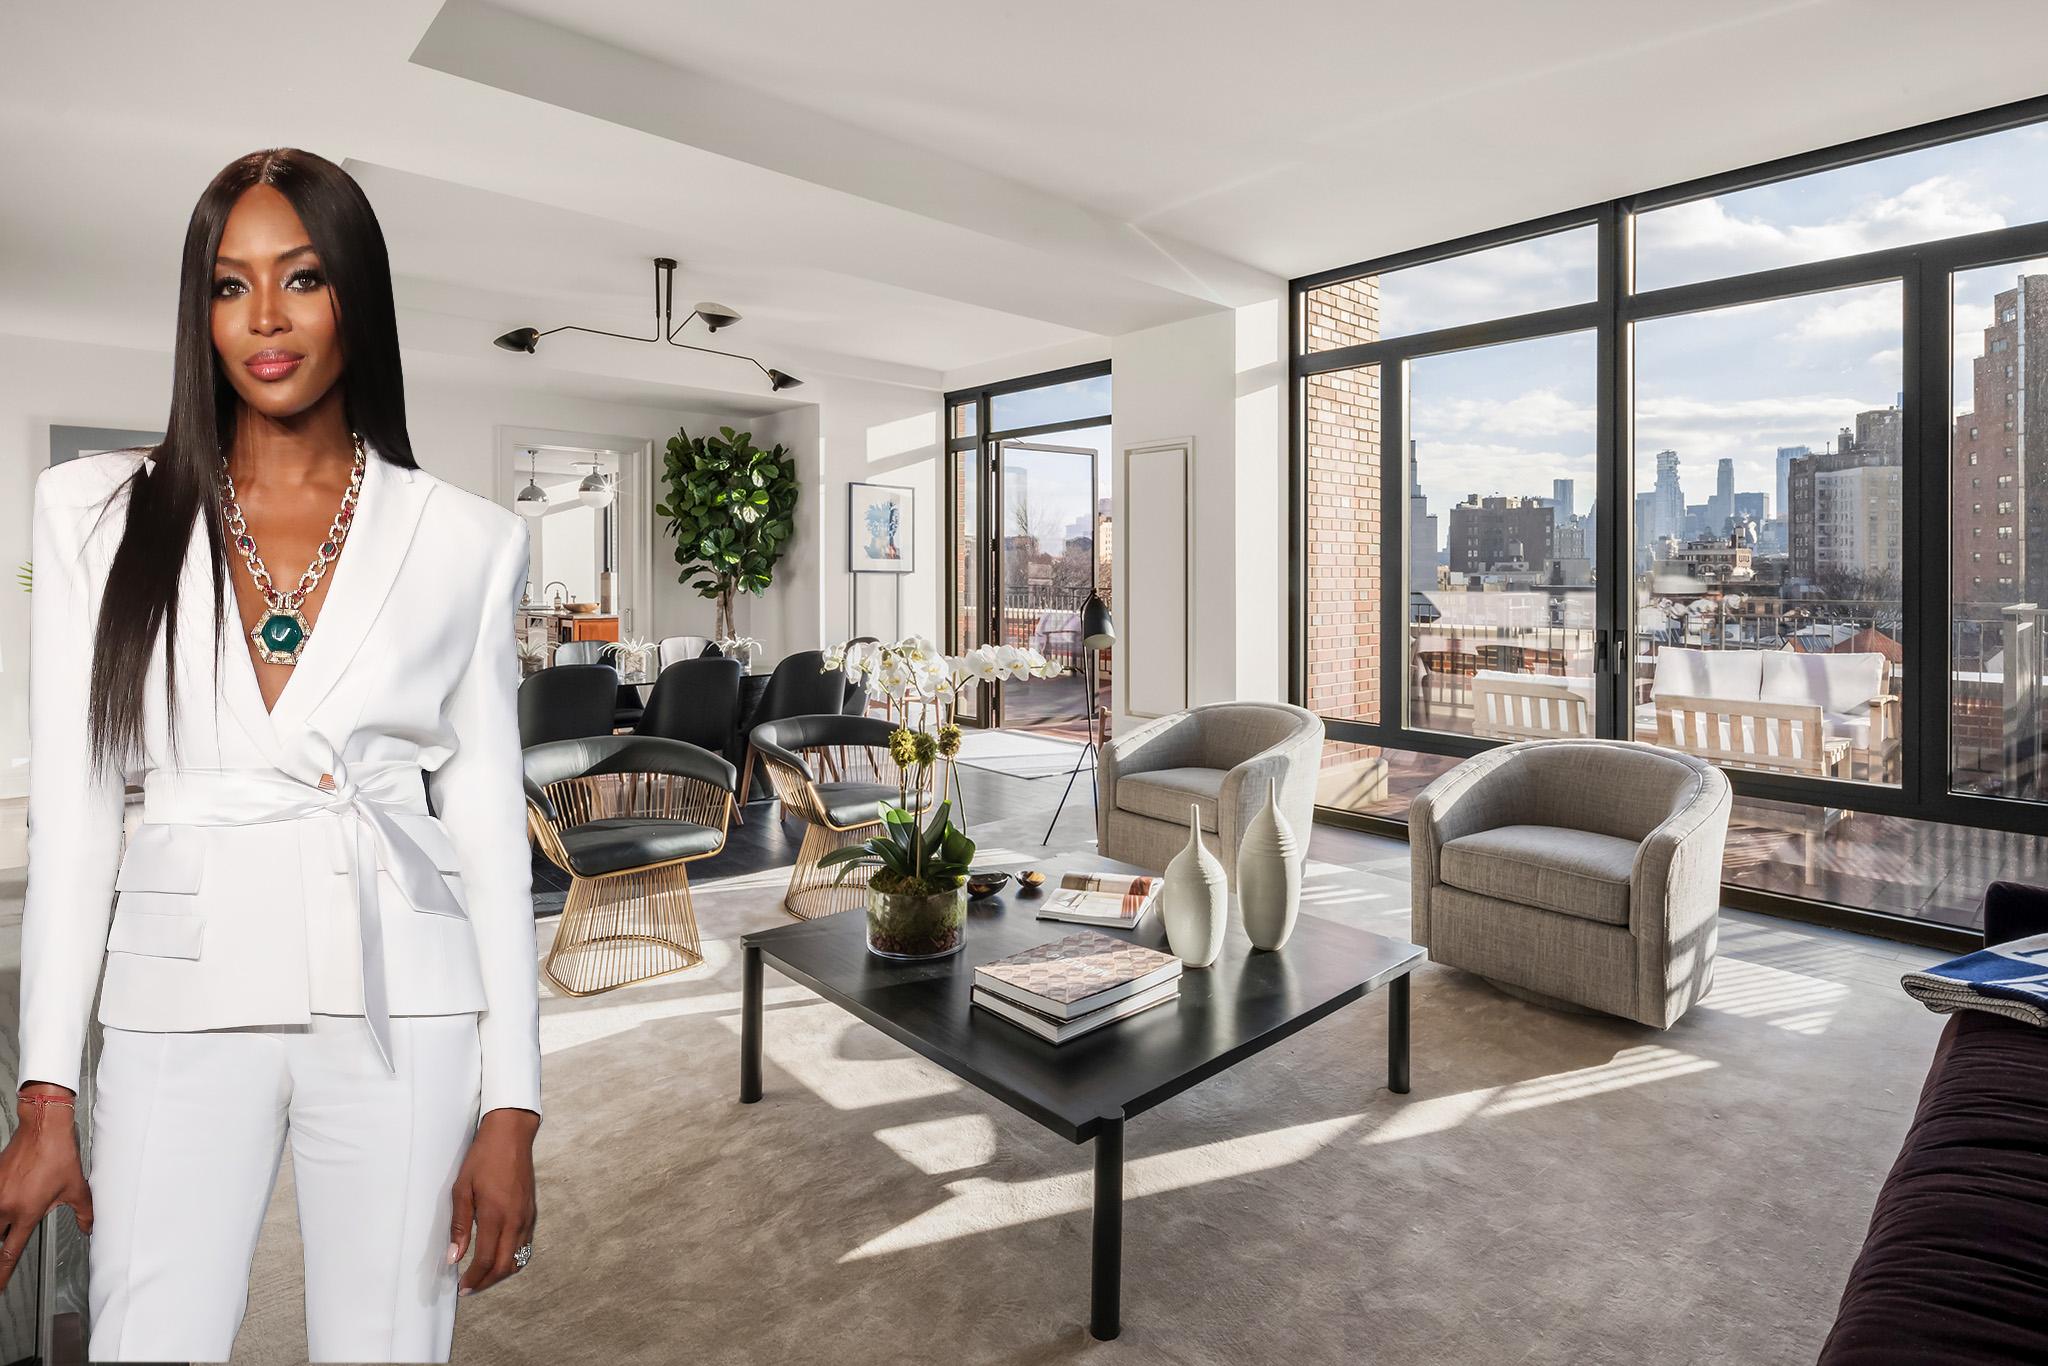 Naomi Campbell Checks Out 18 Million West Village Penthouse Wwd